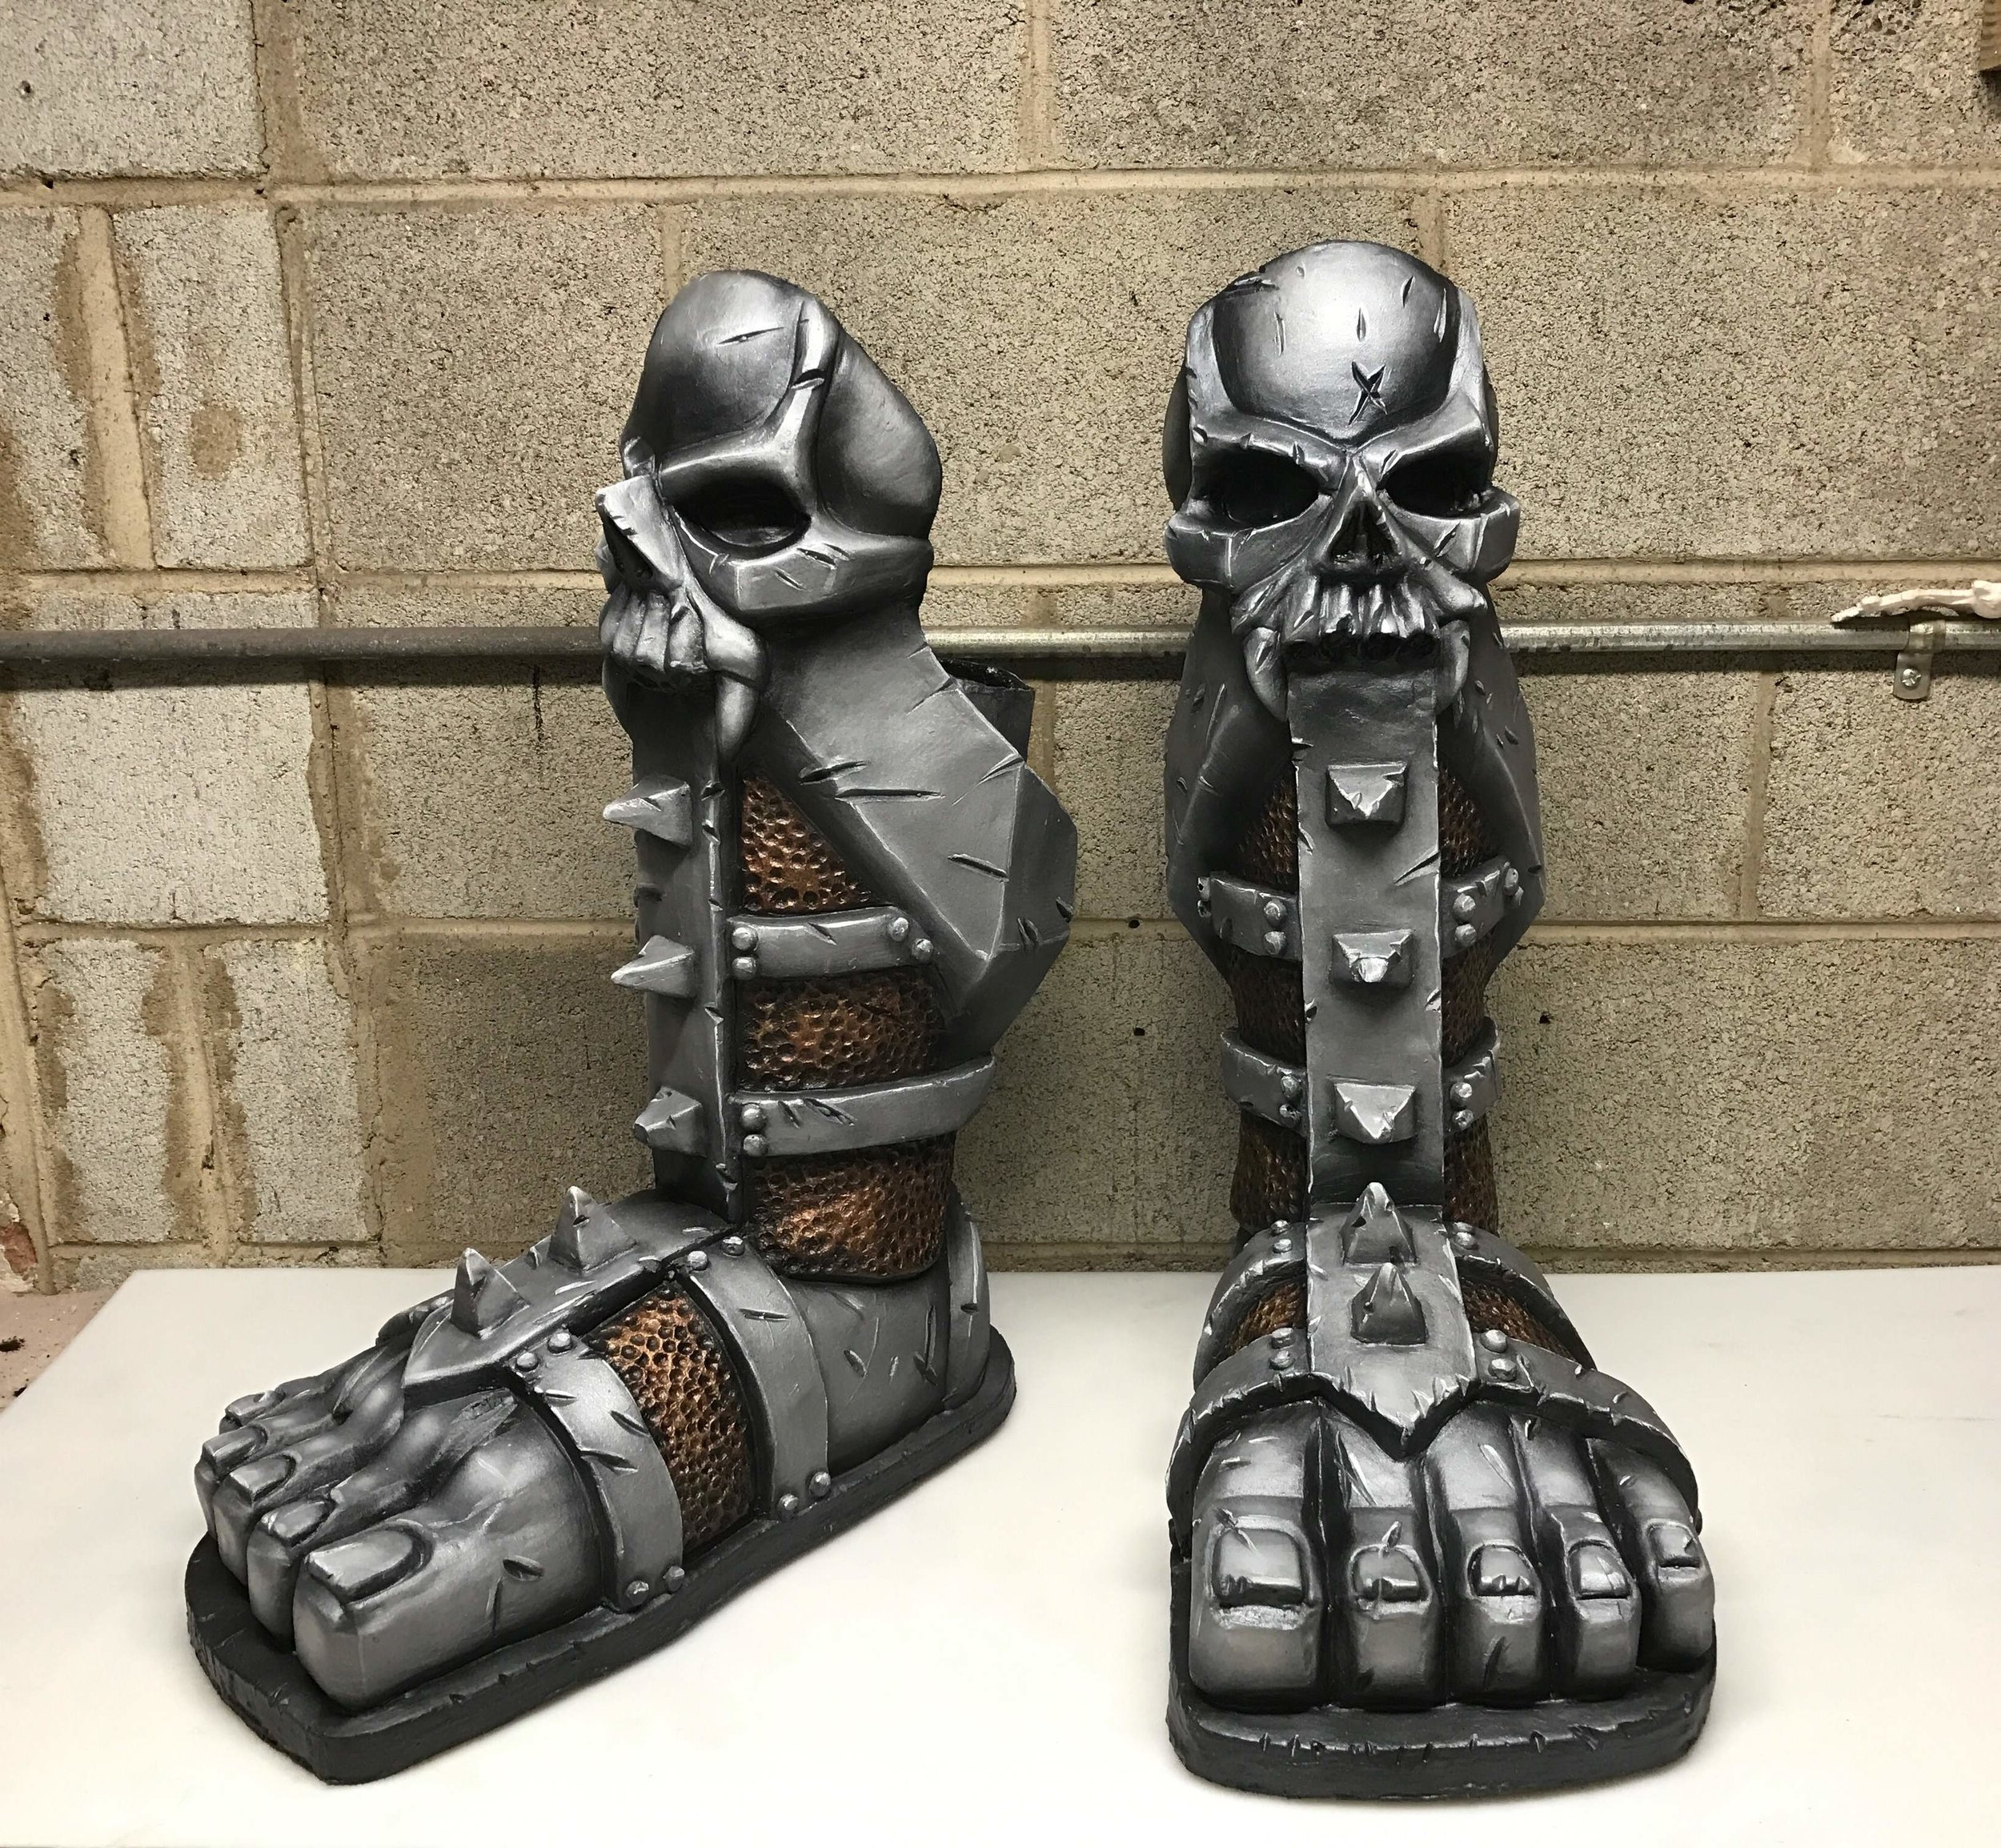 Beefcake Foot Armor